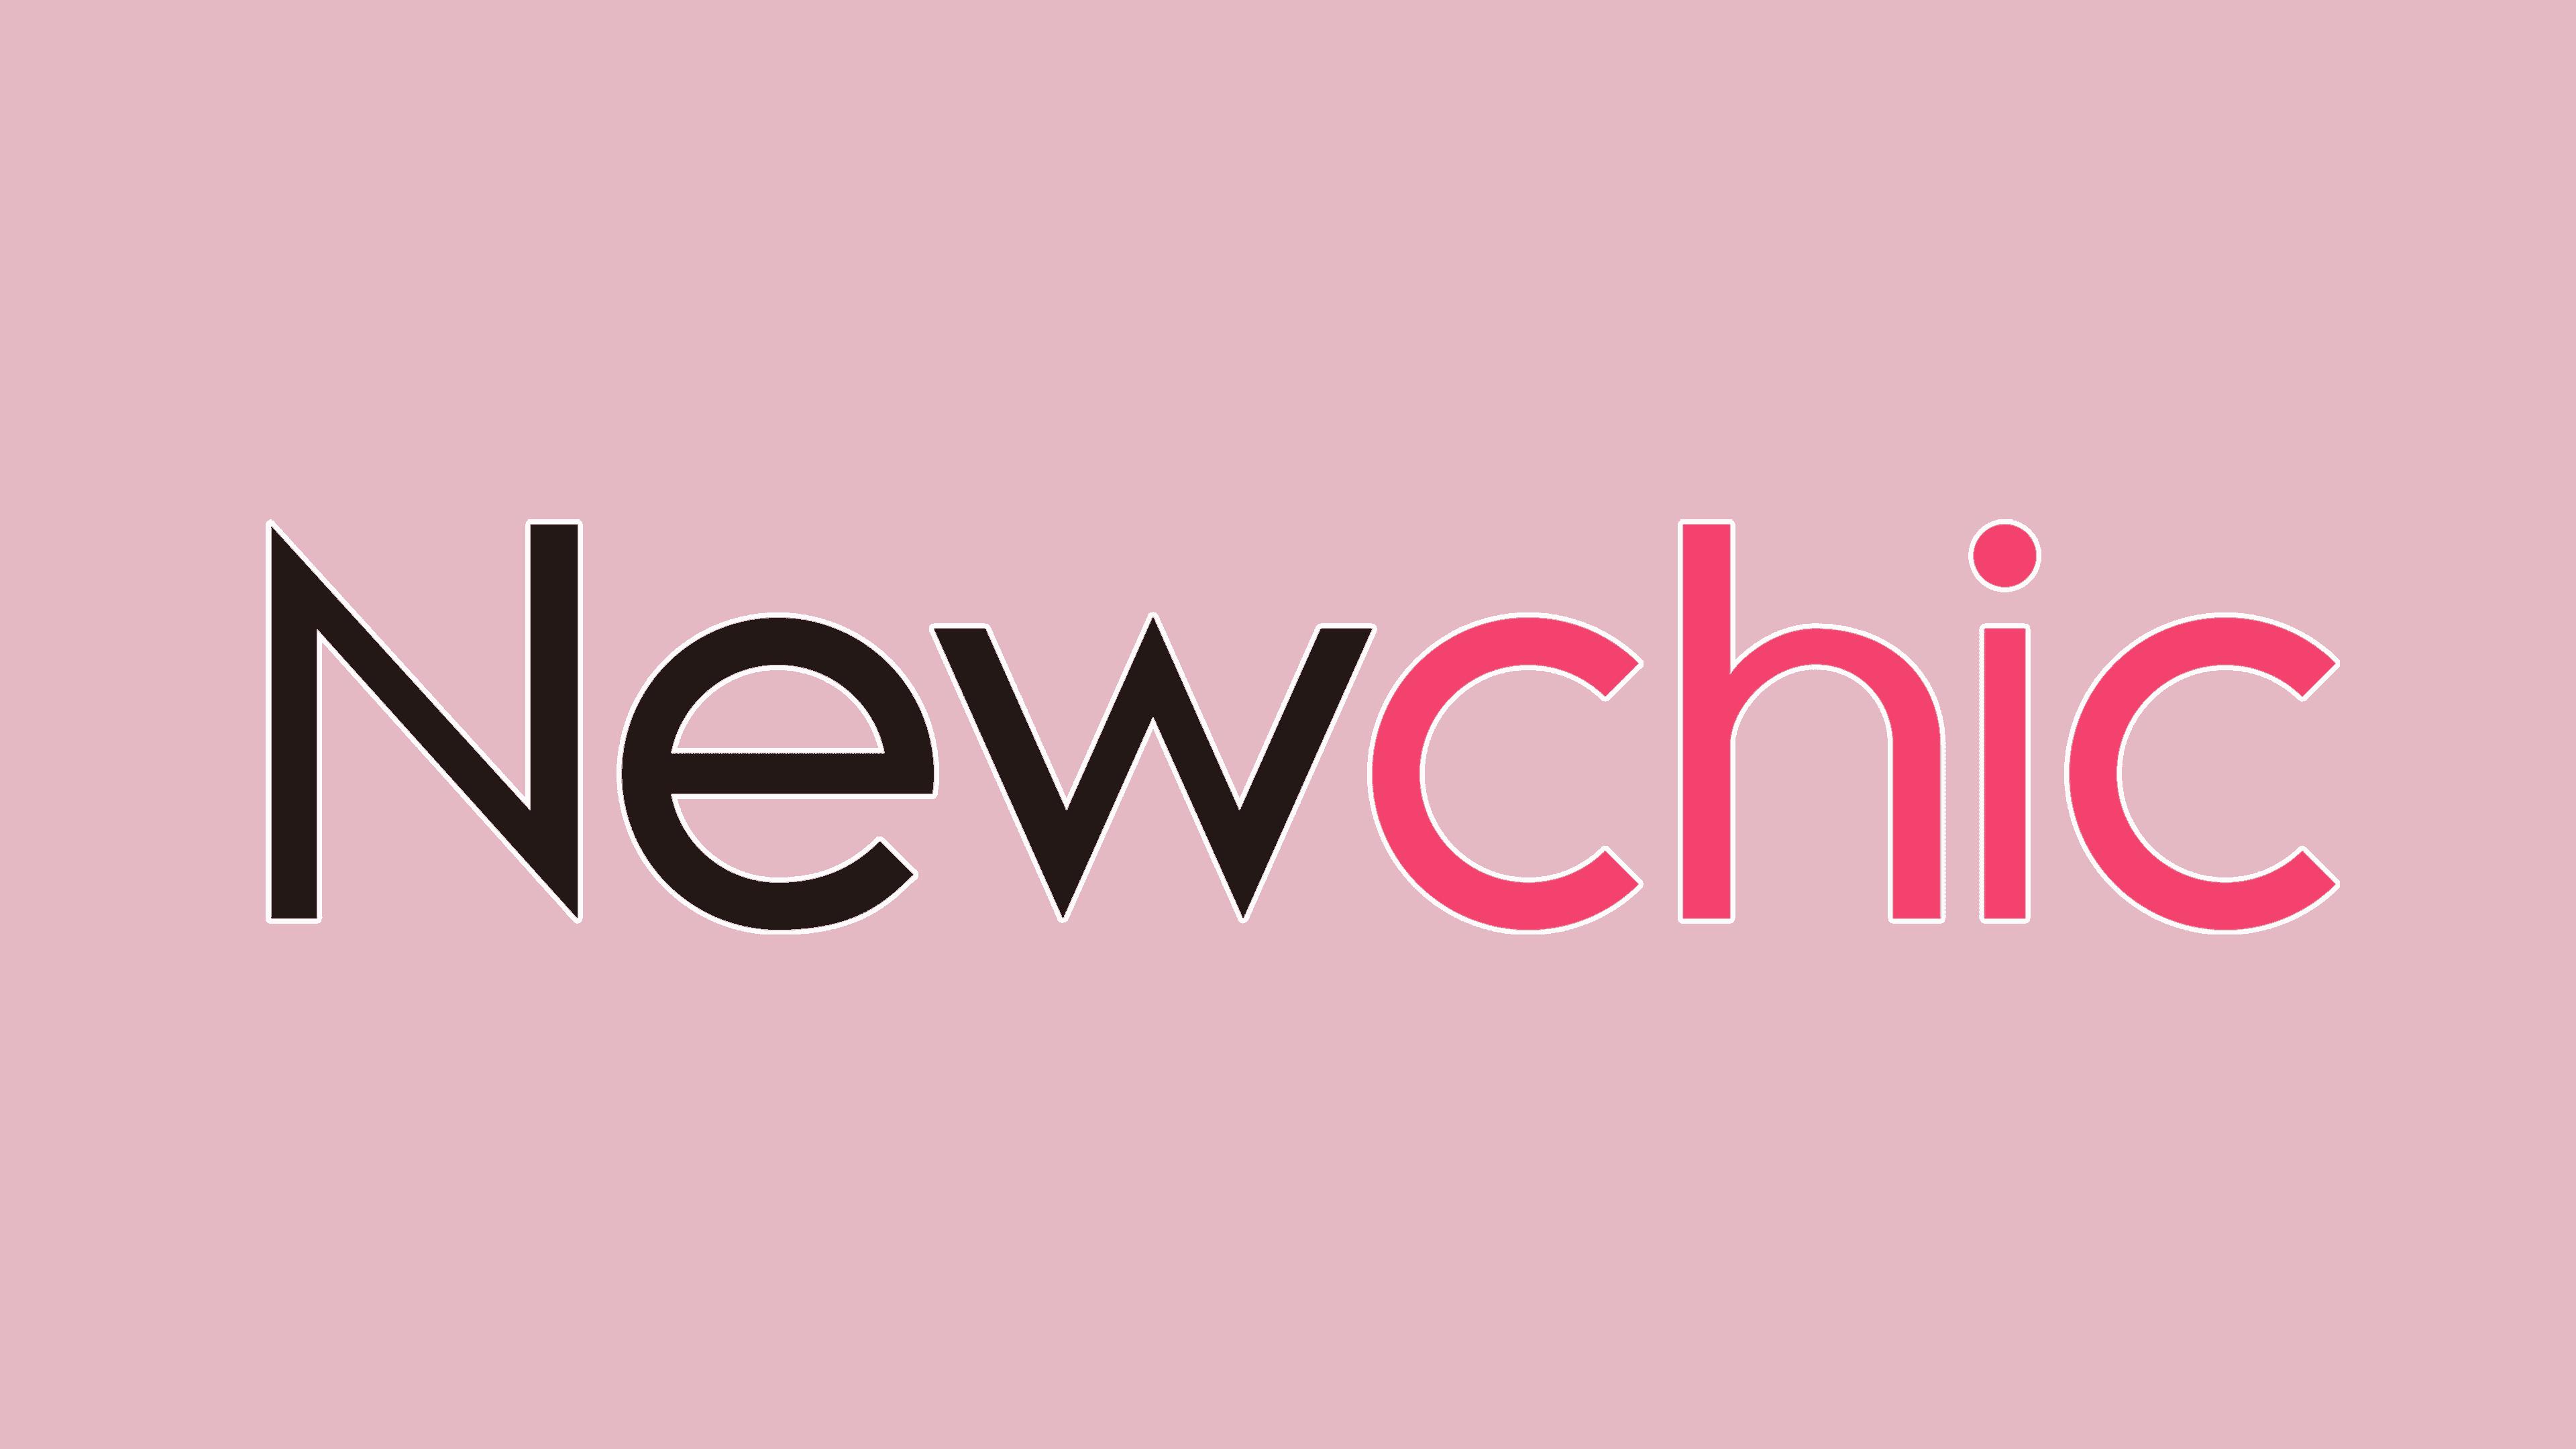 NewChic student discounts logo